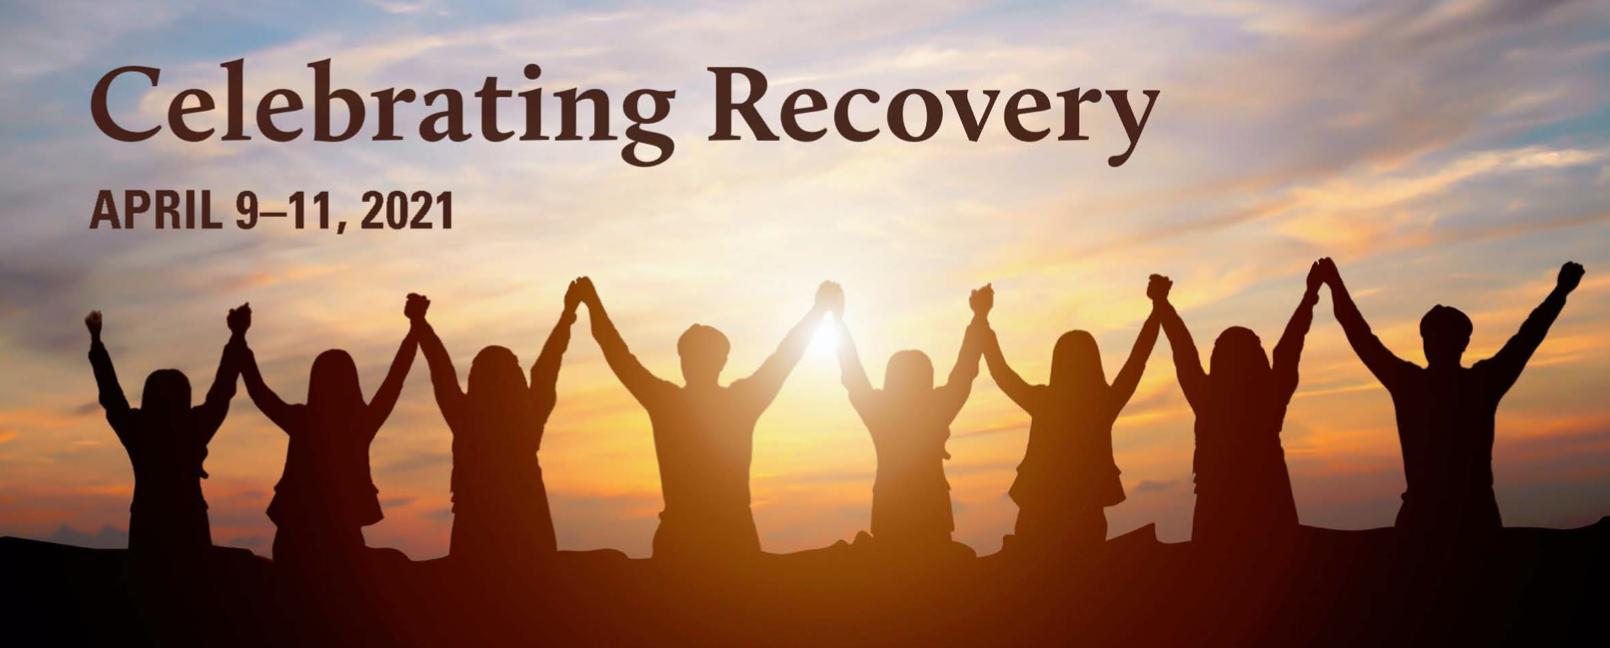 Celebrating Recovery, April 9-11, 2021